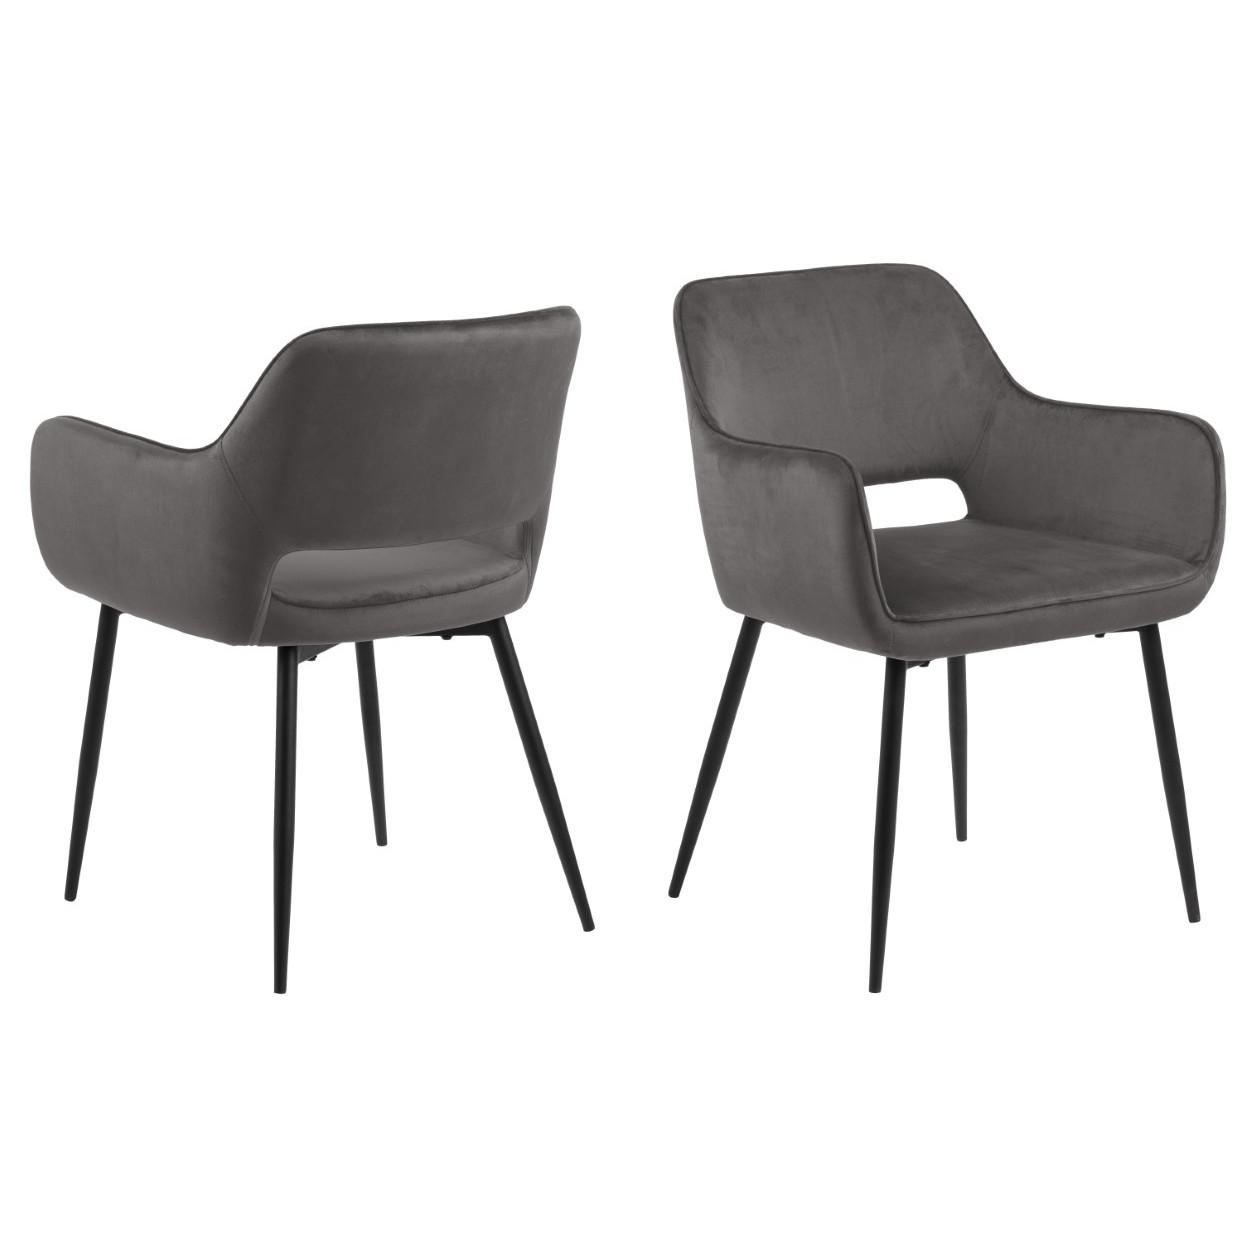 2-er Set Stühle Banja | Dunkelgrau